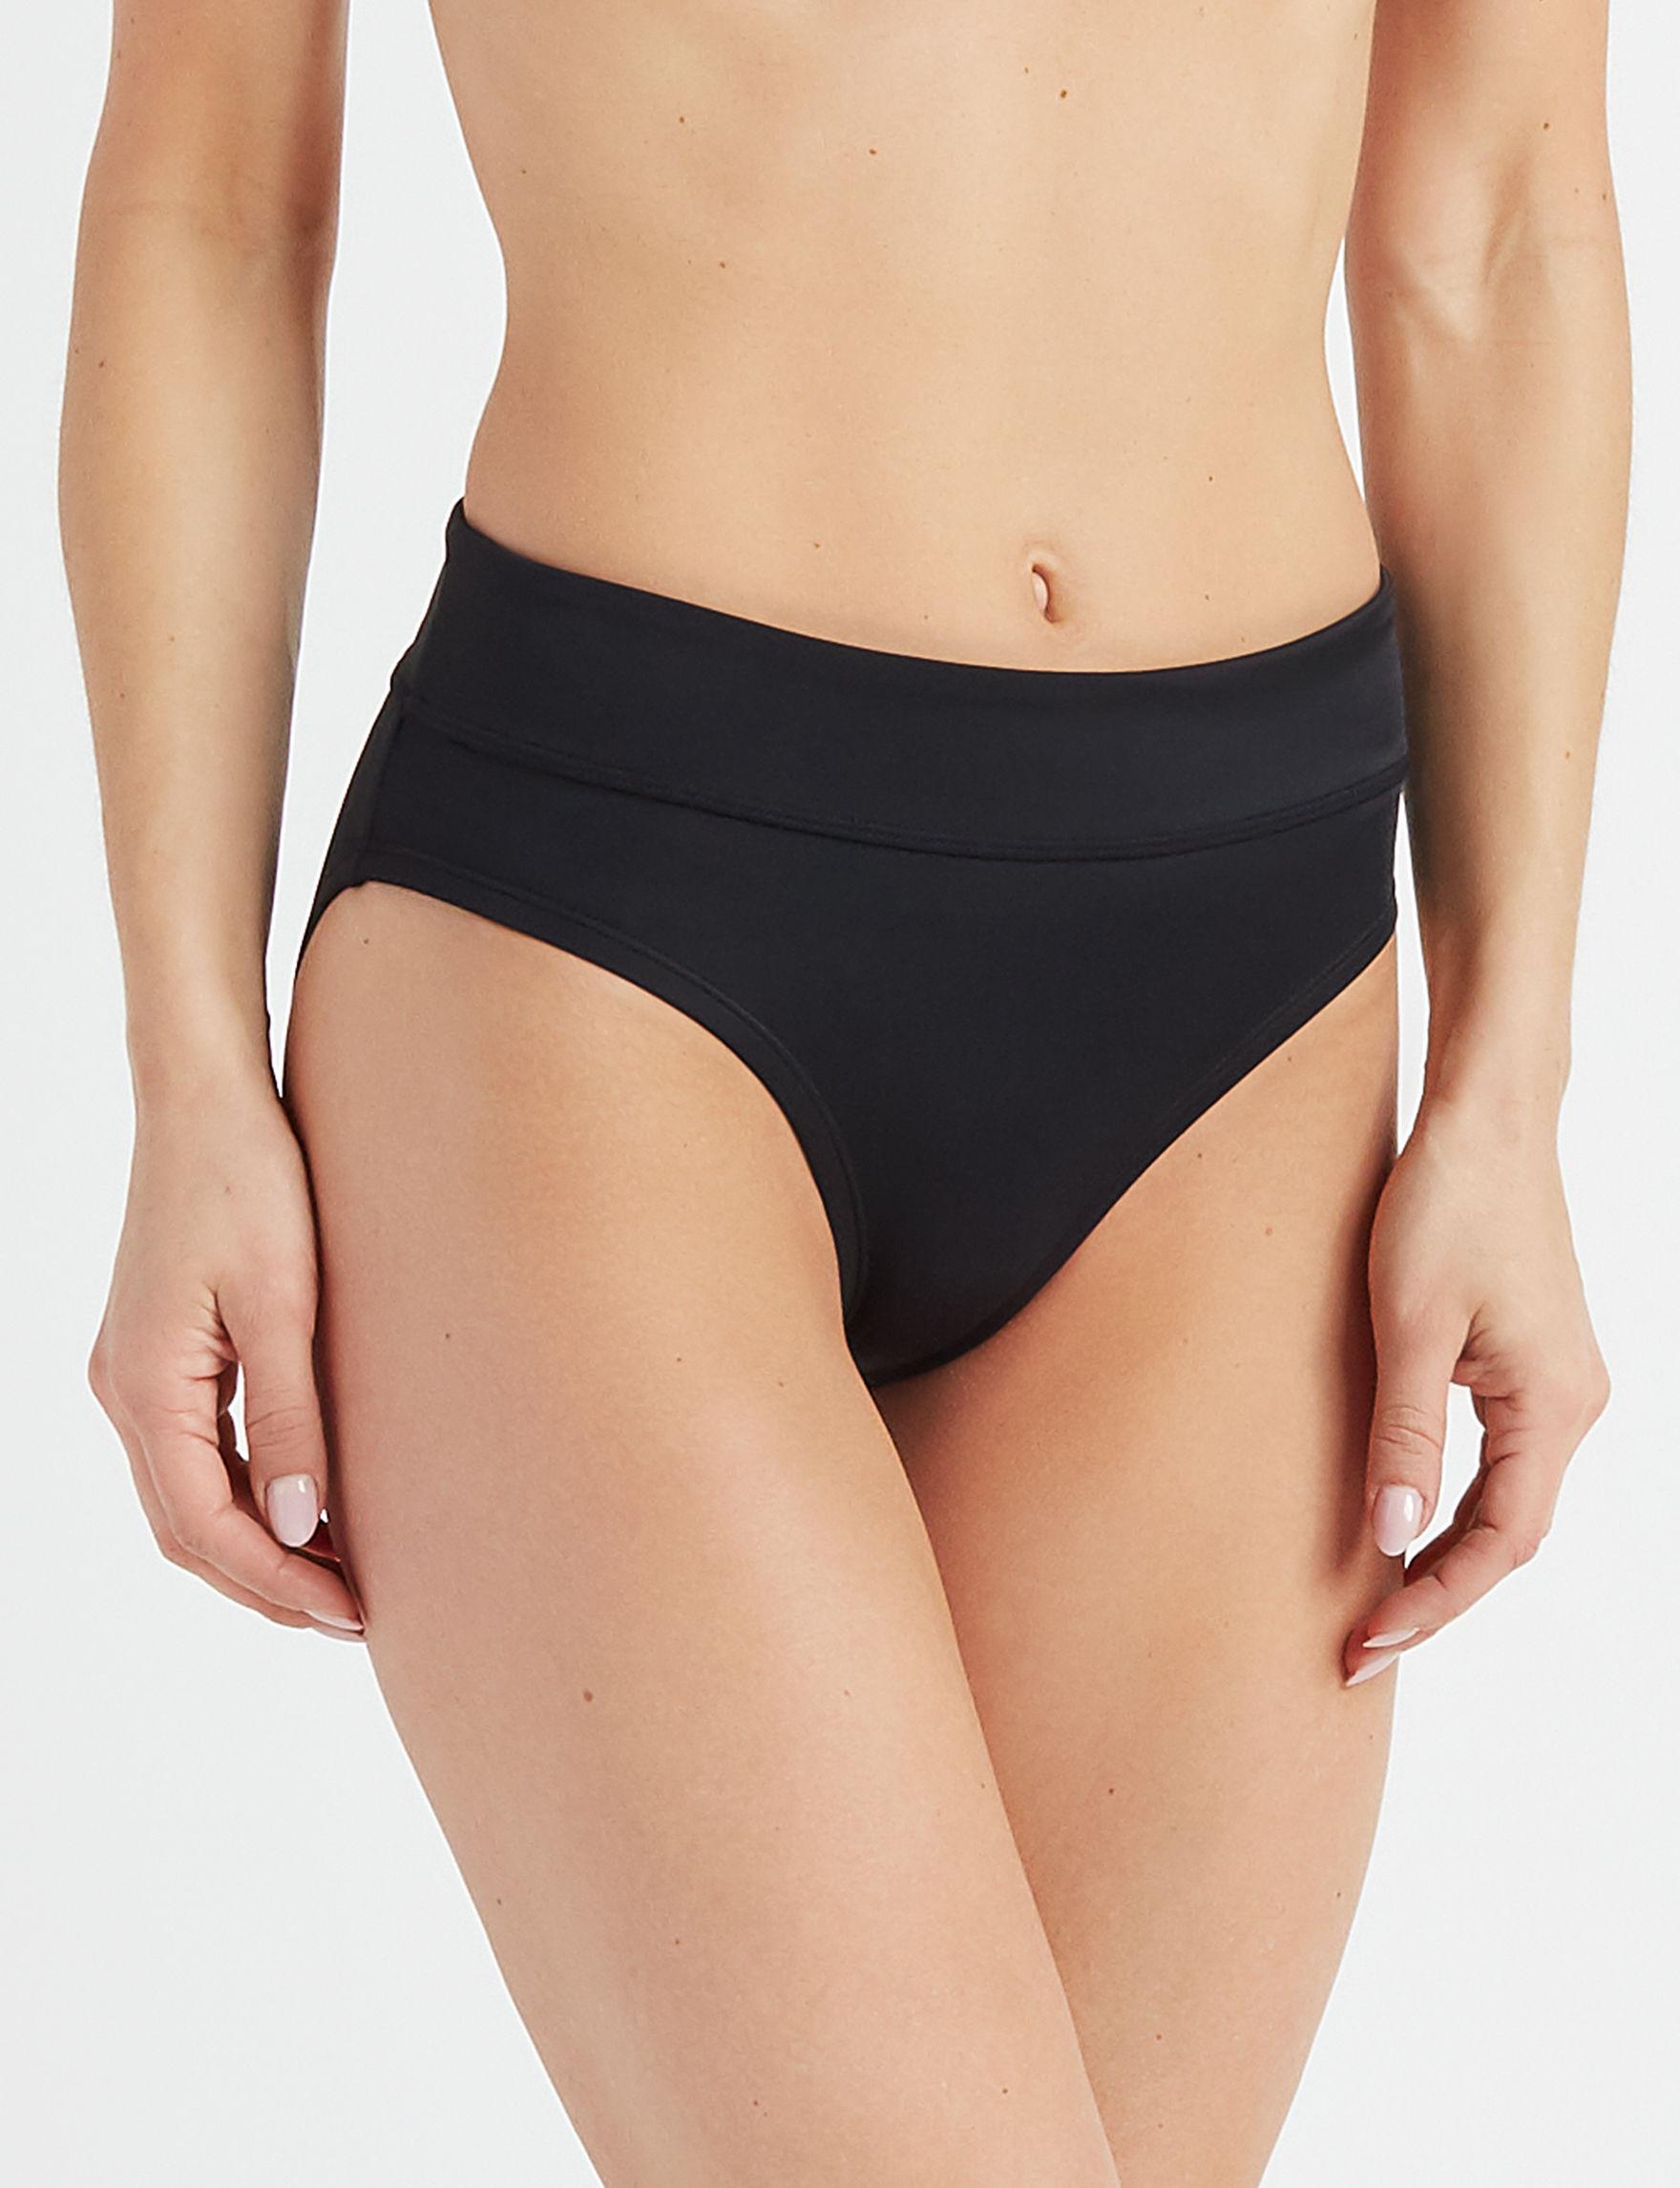 Nike Black Swimsuit Bottoms Hipster